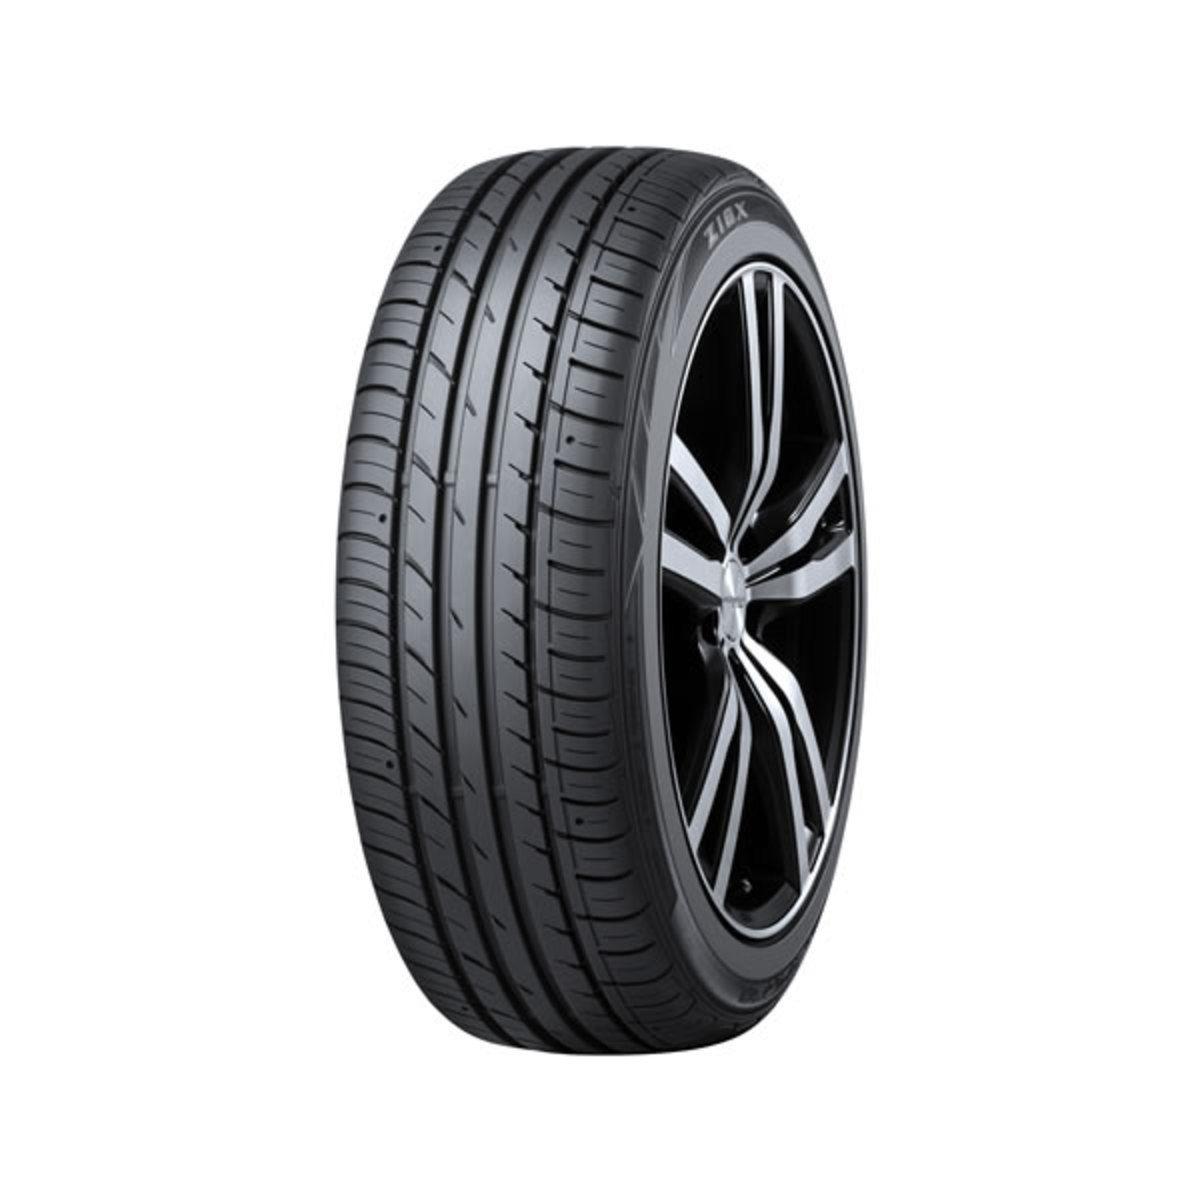 Pneu Dunlop 225/45Z R18 95Y SP SPORT MAXX 050+